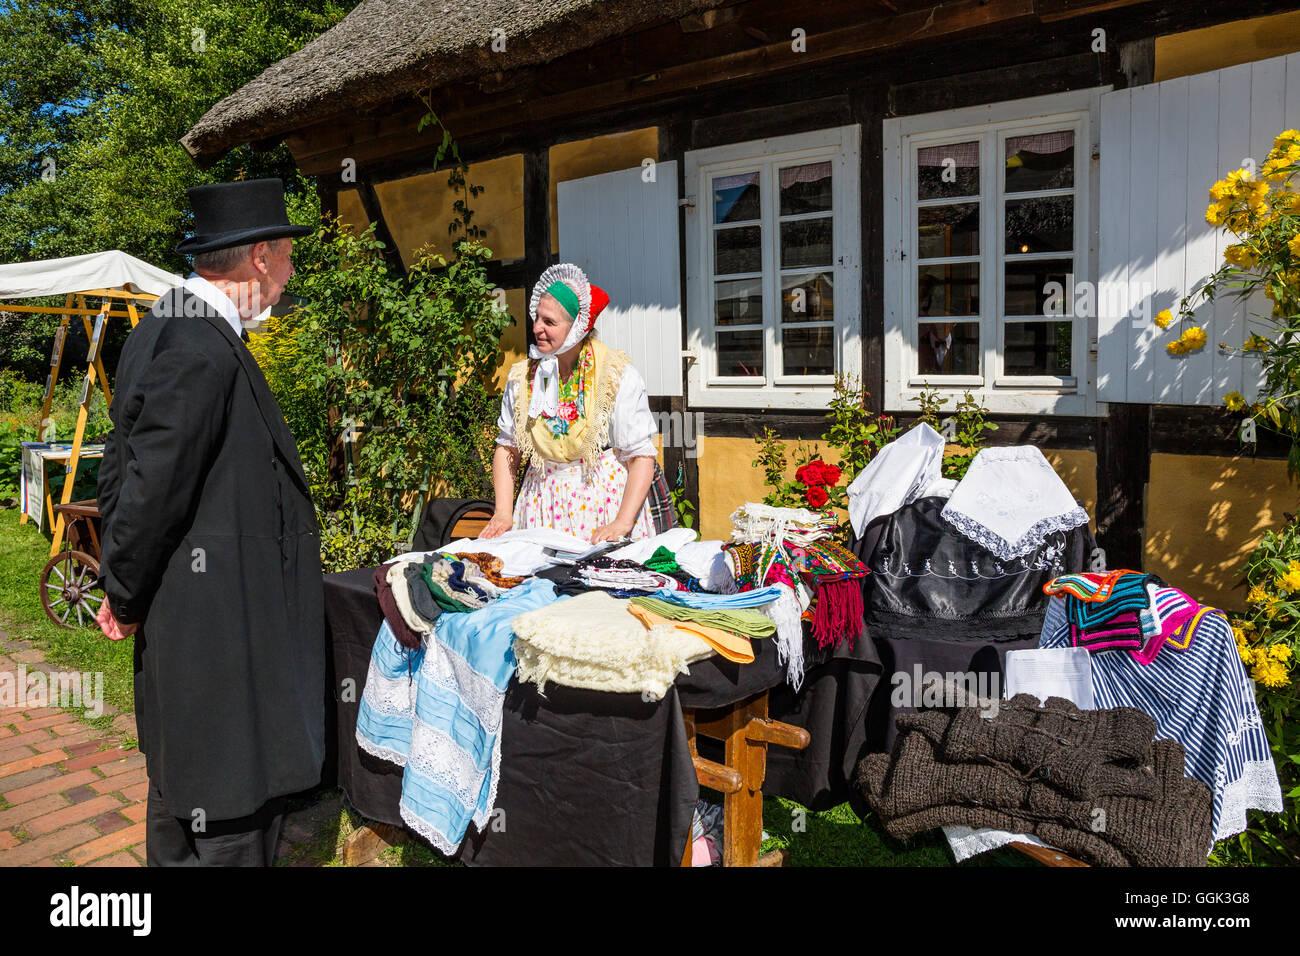 People in traditional costumes in Open Air Museum Lehde, Spreewald, UNESCO biosphere reserve, Lübbenau, Brandenburg, - Stock Image